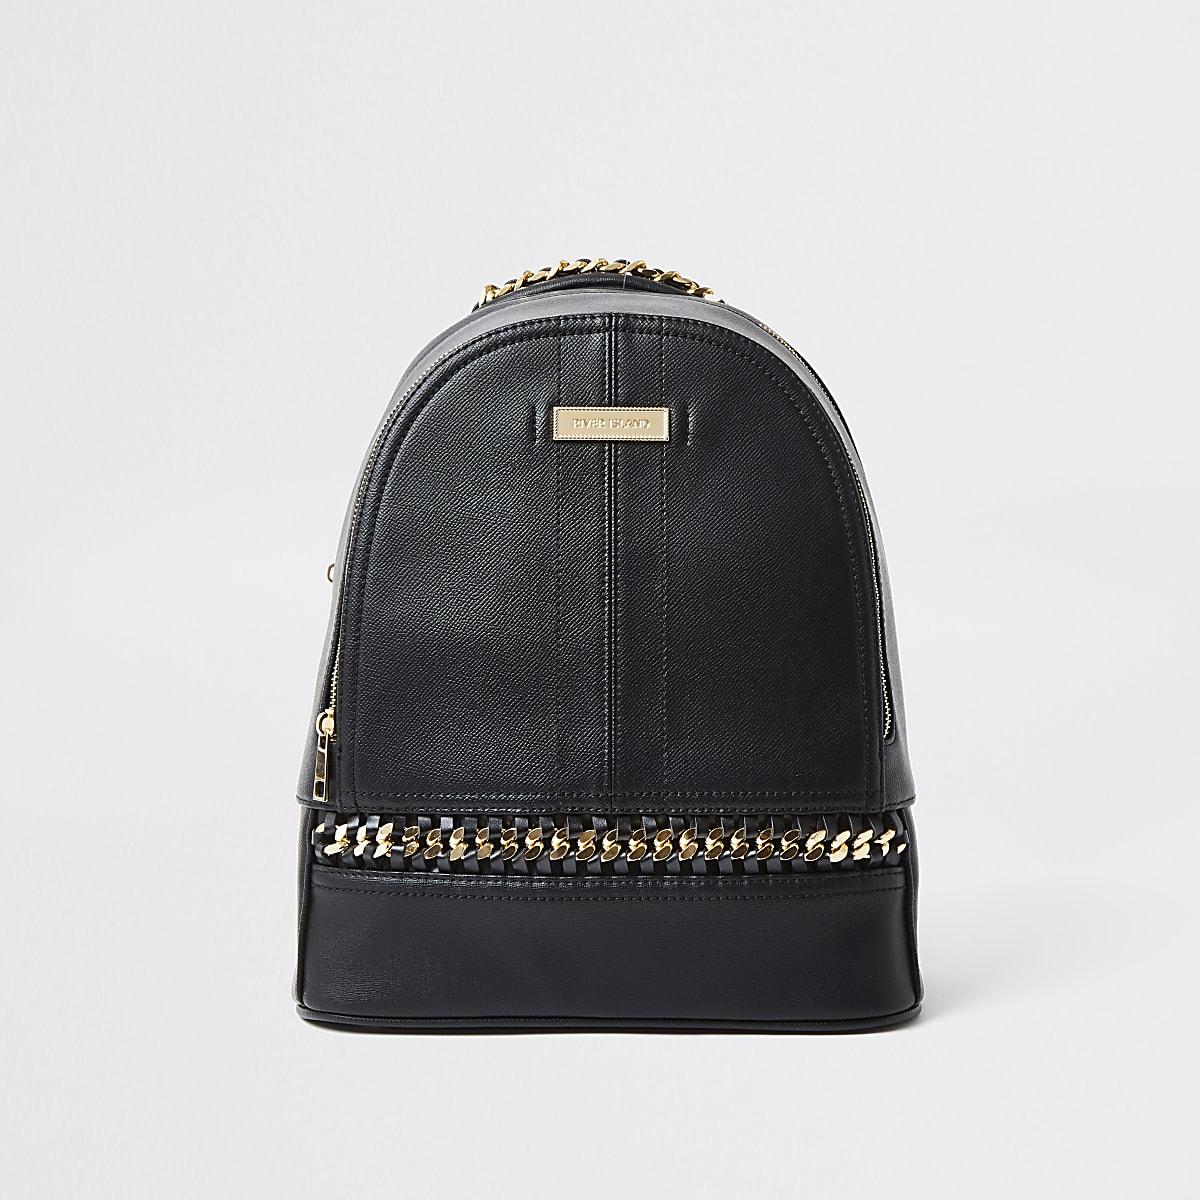 River Island handbag - black backpack